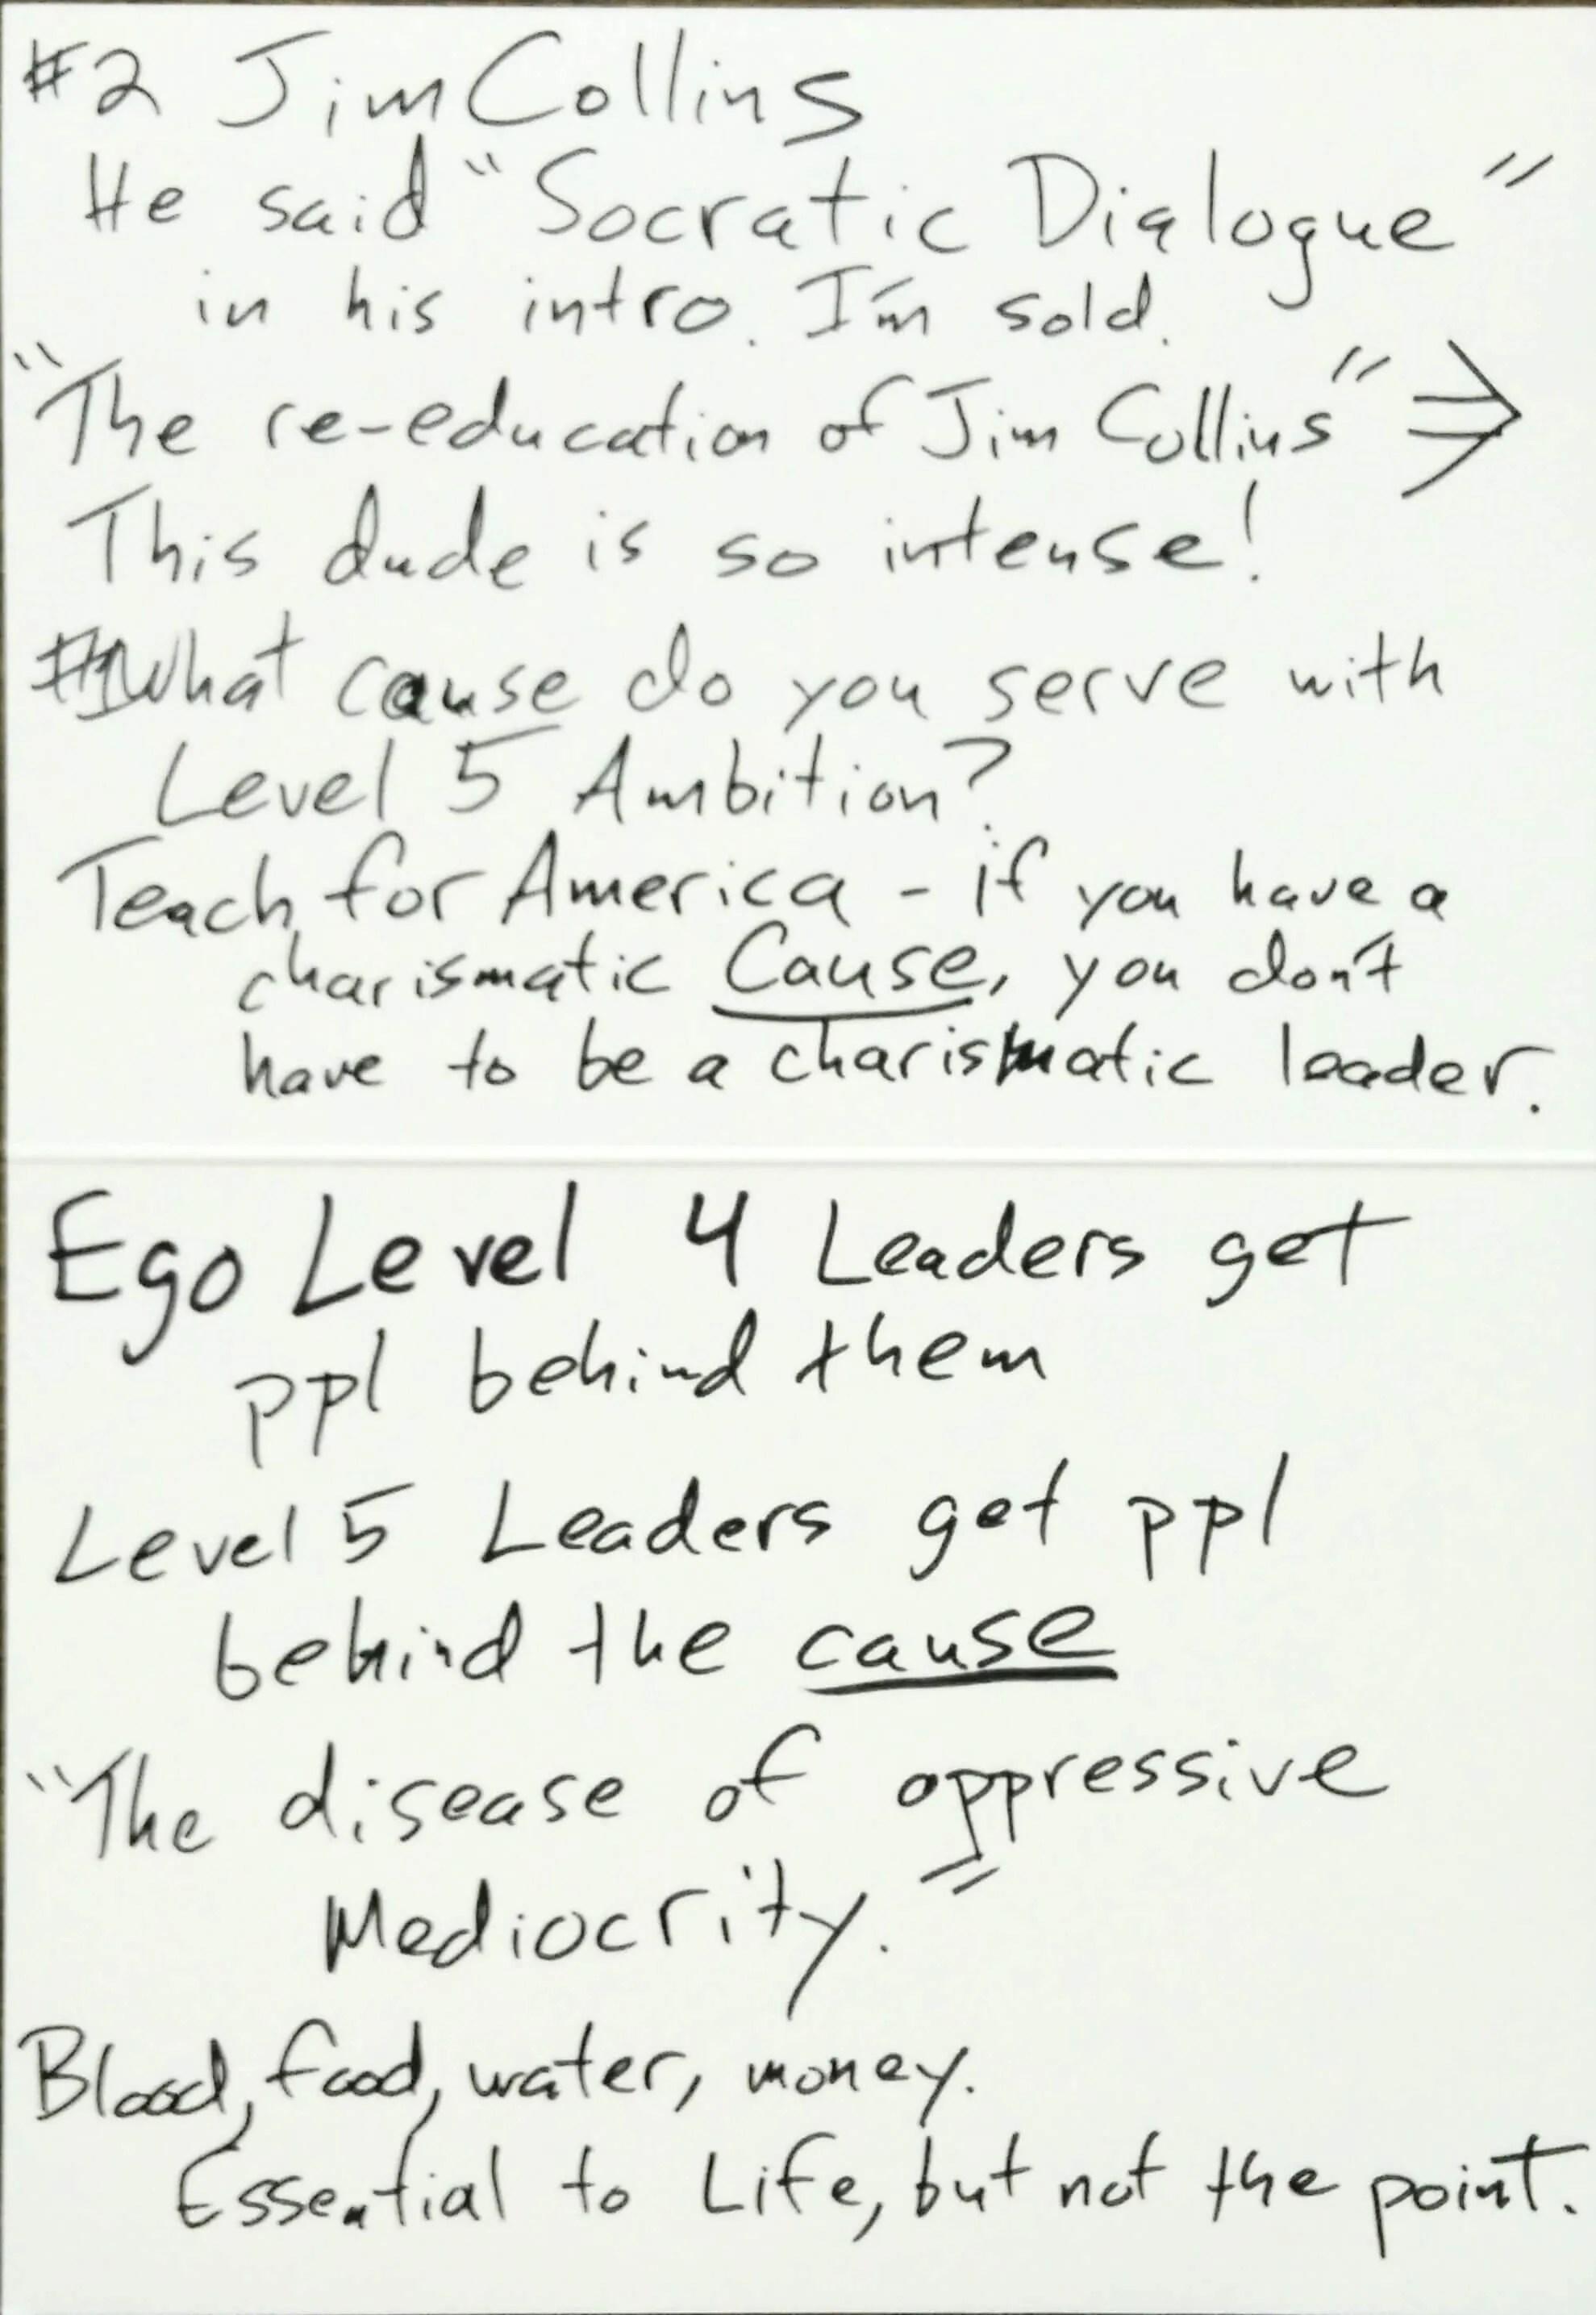 WCAGLS2015-Jim-Collins-1-1